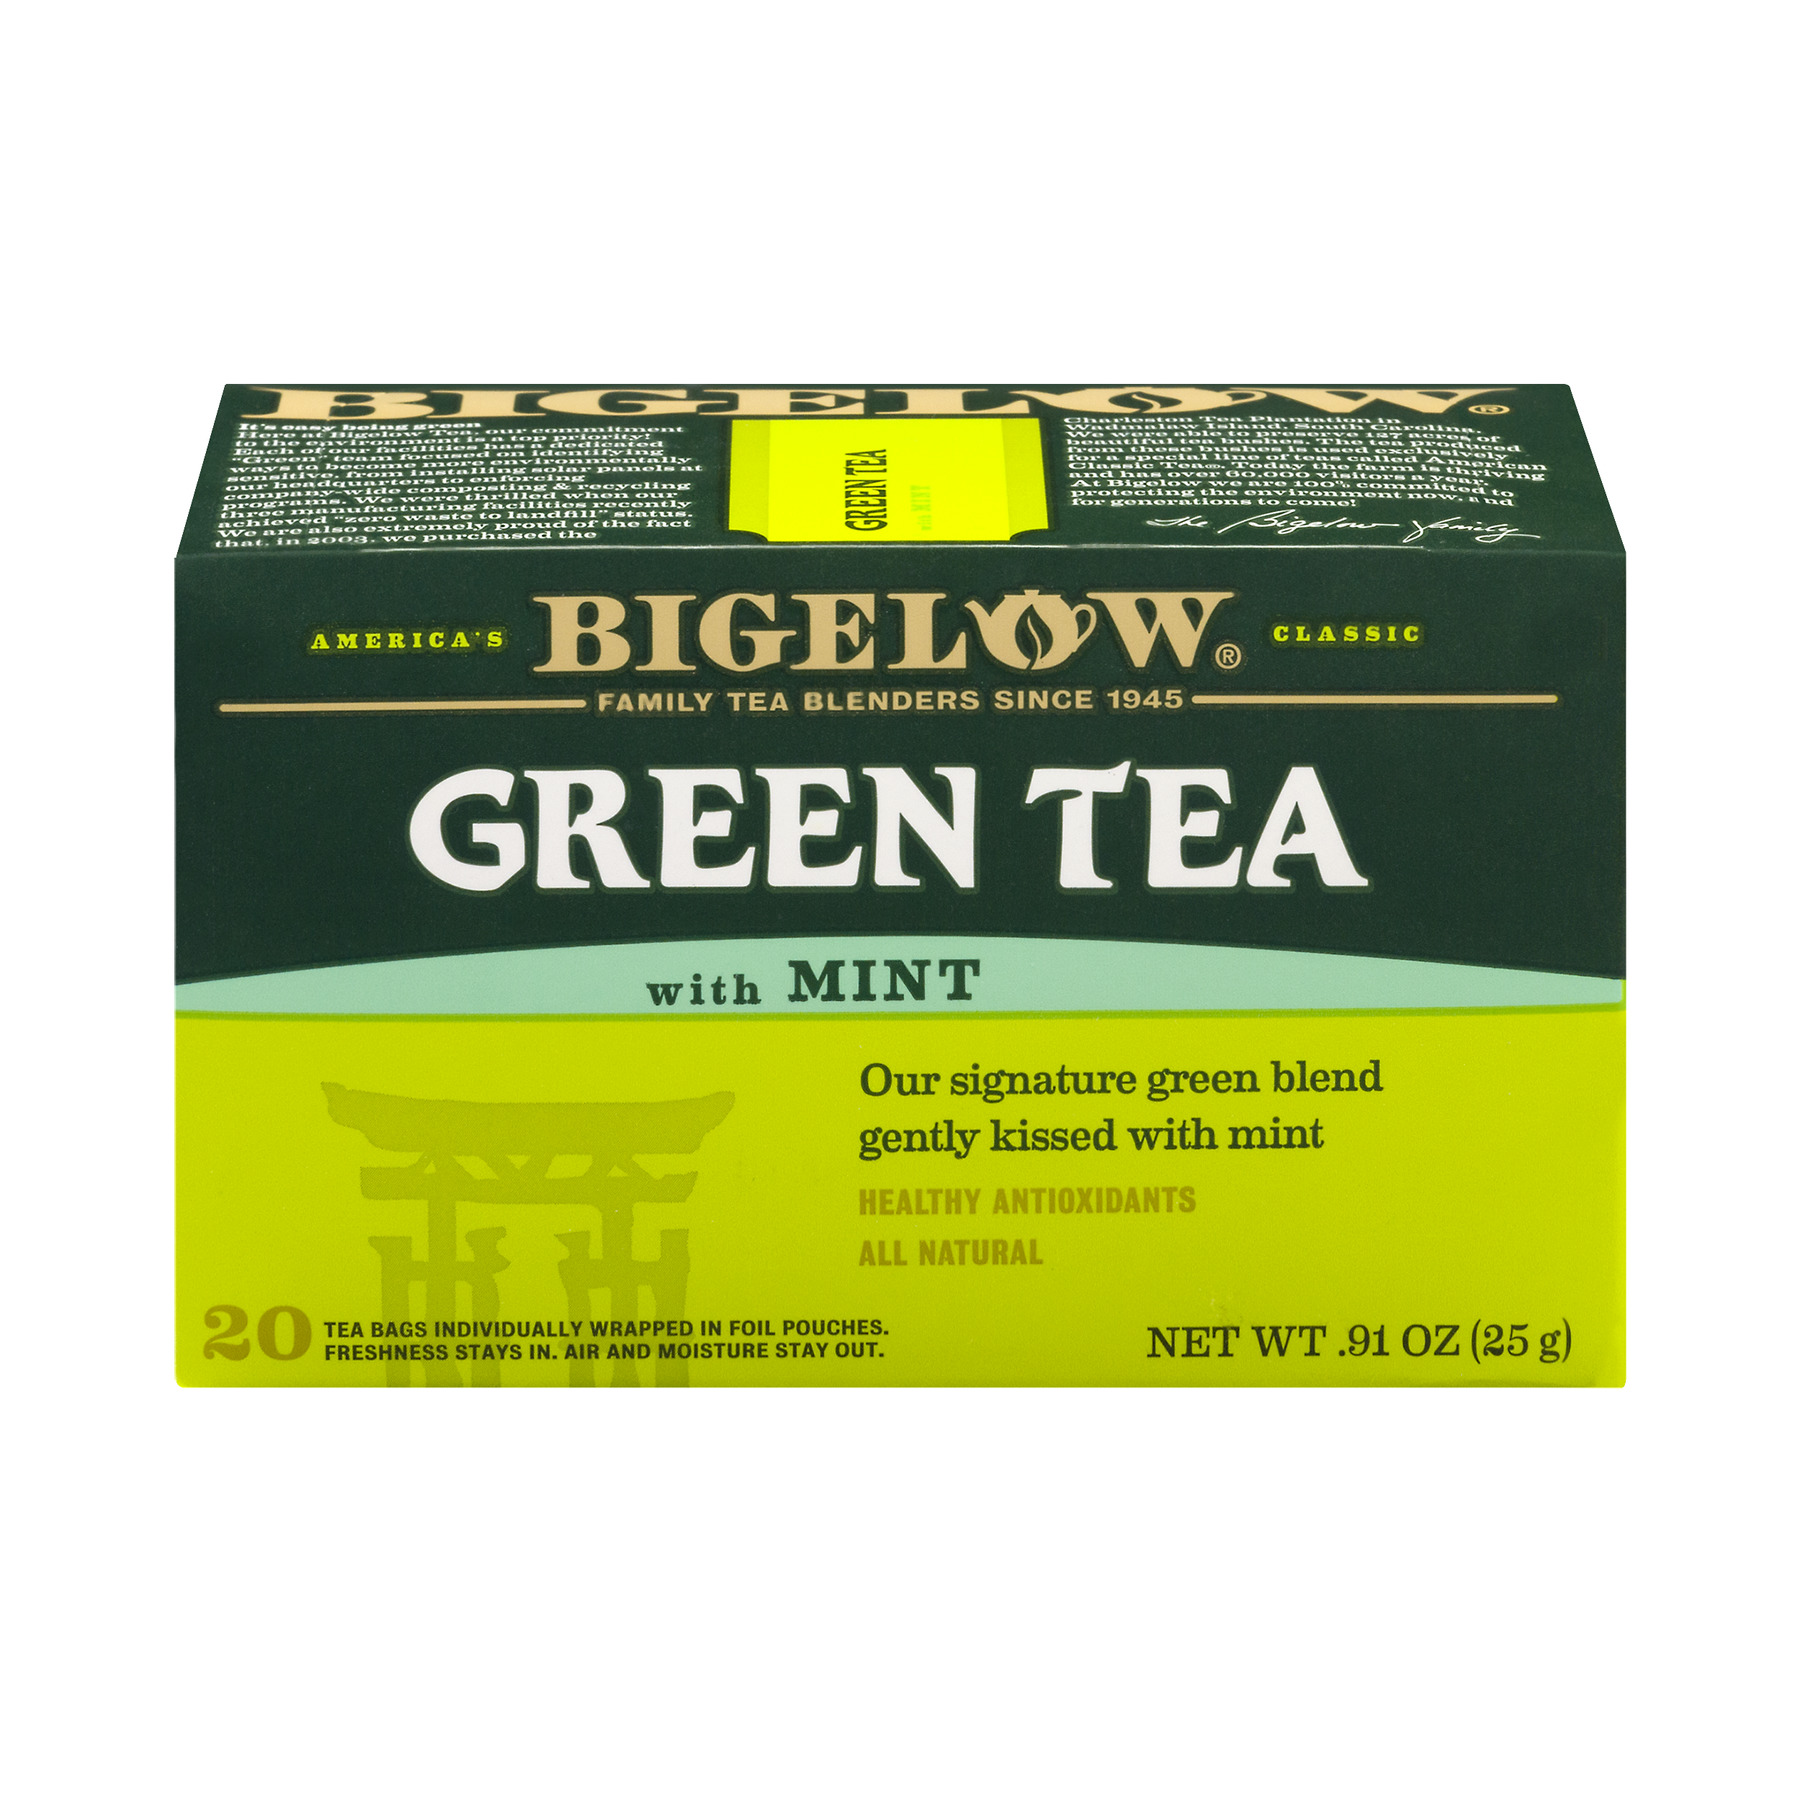 Bigelow Green Tea with Mint 20 CT by R.C. Bigelow, Inc.